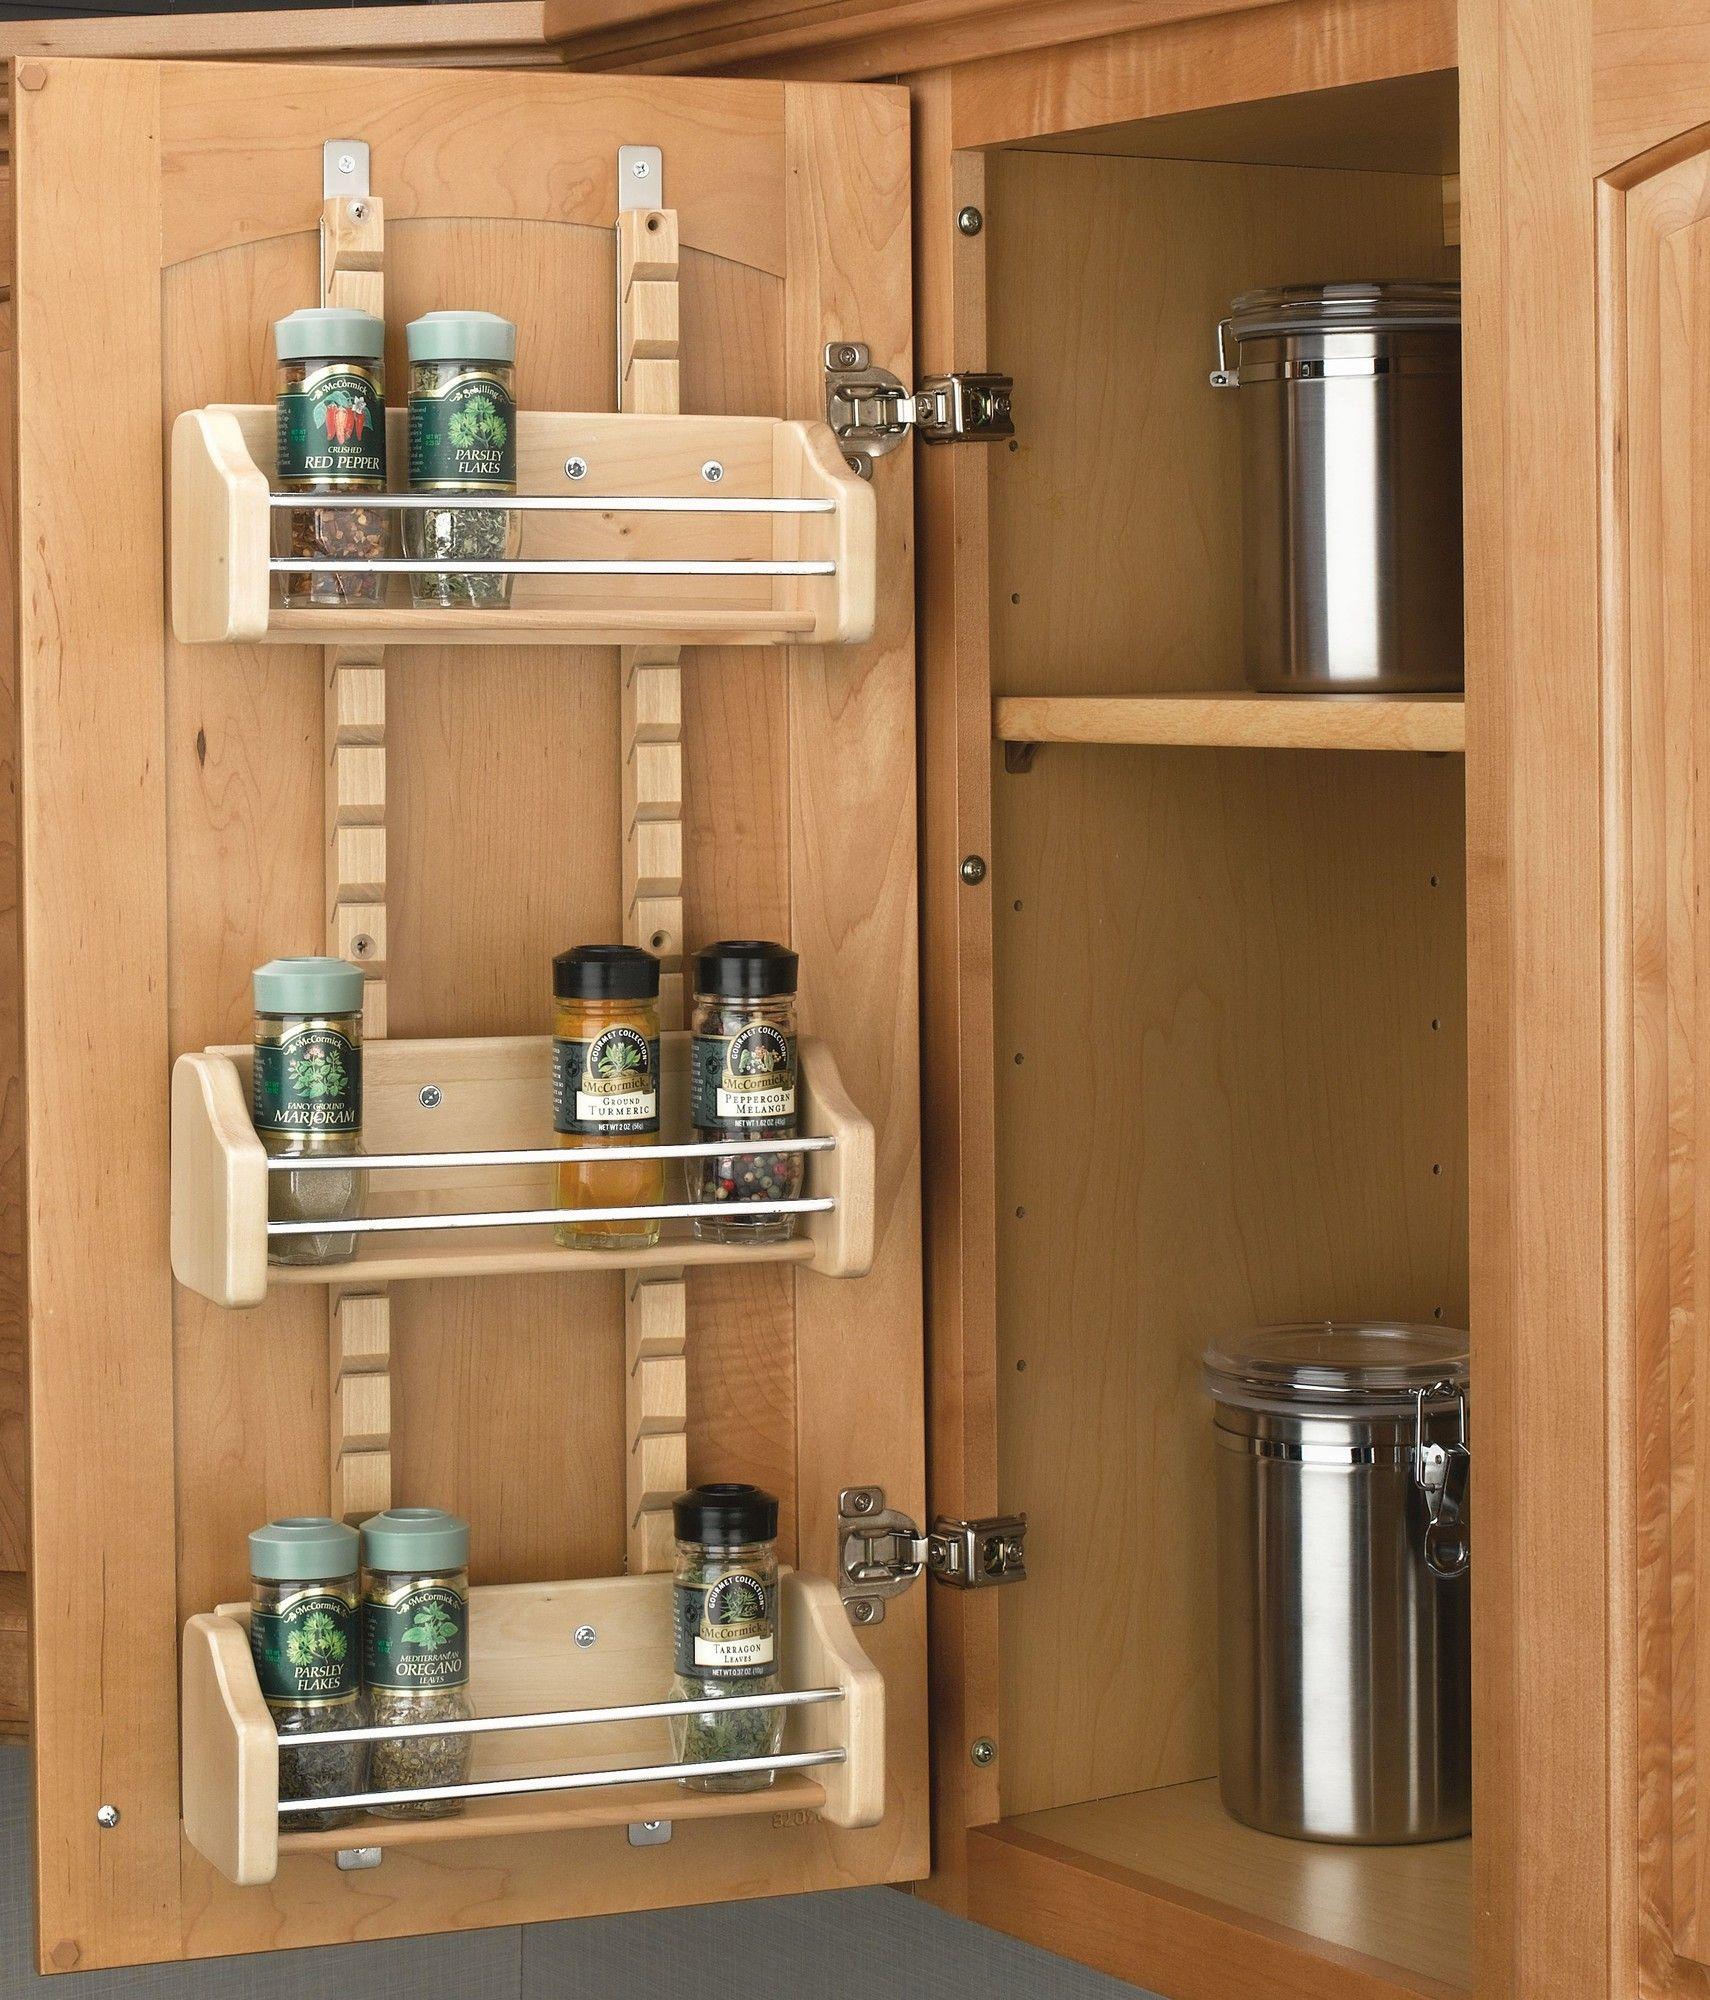 Spice Jar And Rack Set Door Mounted Spice Rack Wood Spice Rack Kitchen Cabinet Organization